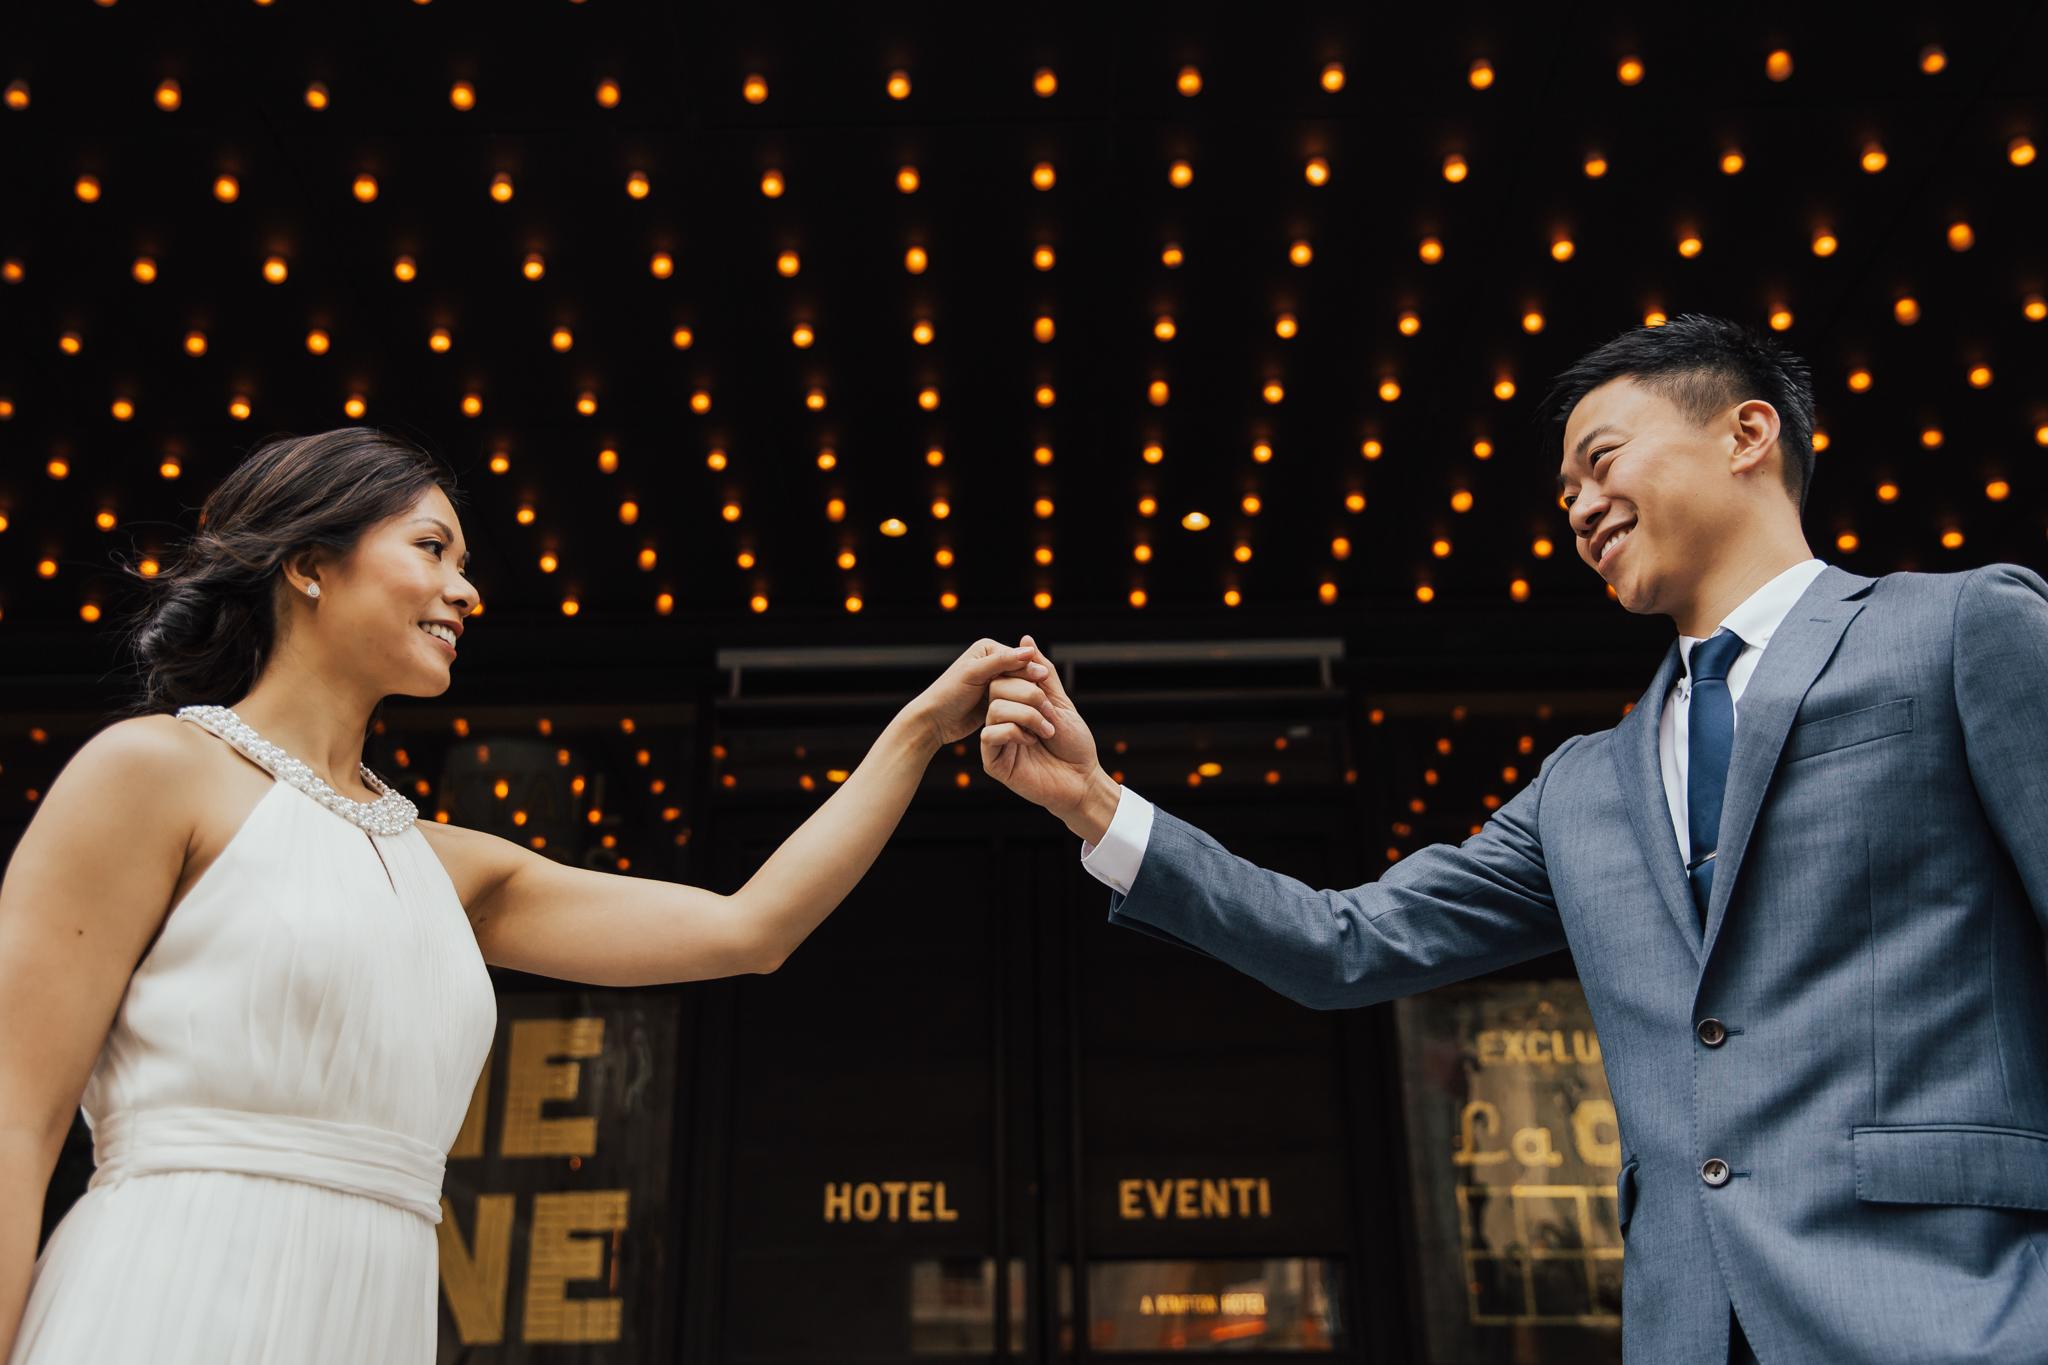 second-floor-wedding-nyc-53.jpg